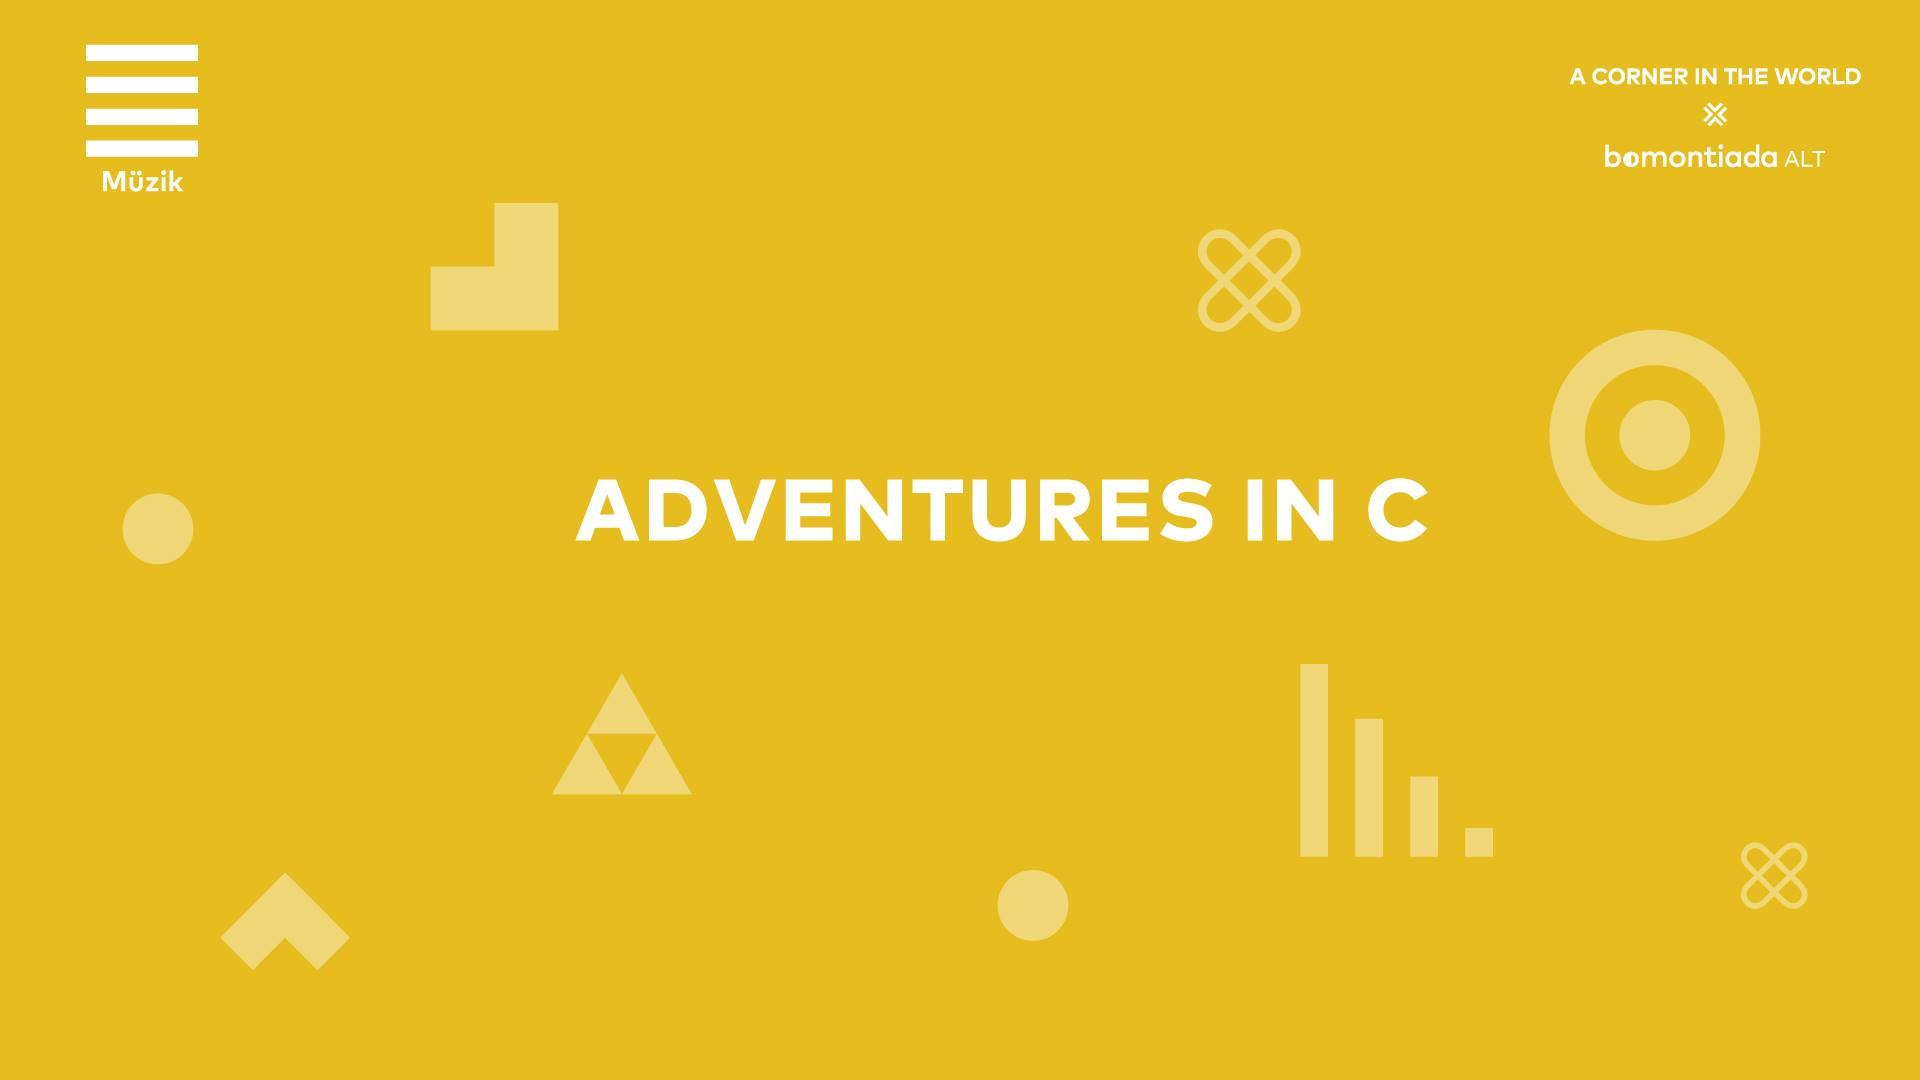 Adventures in C, 27 Eylül Perşembe, bomontiada